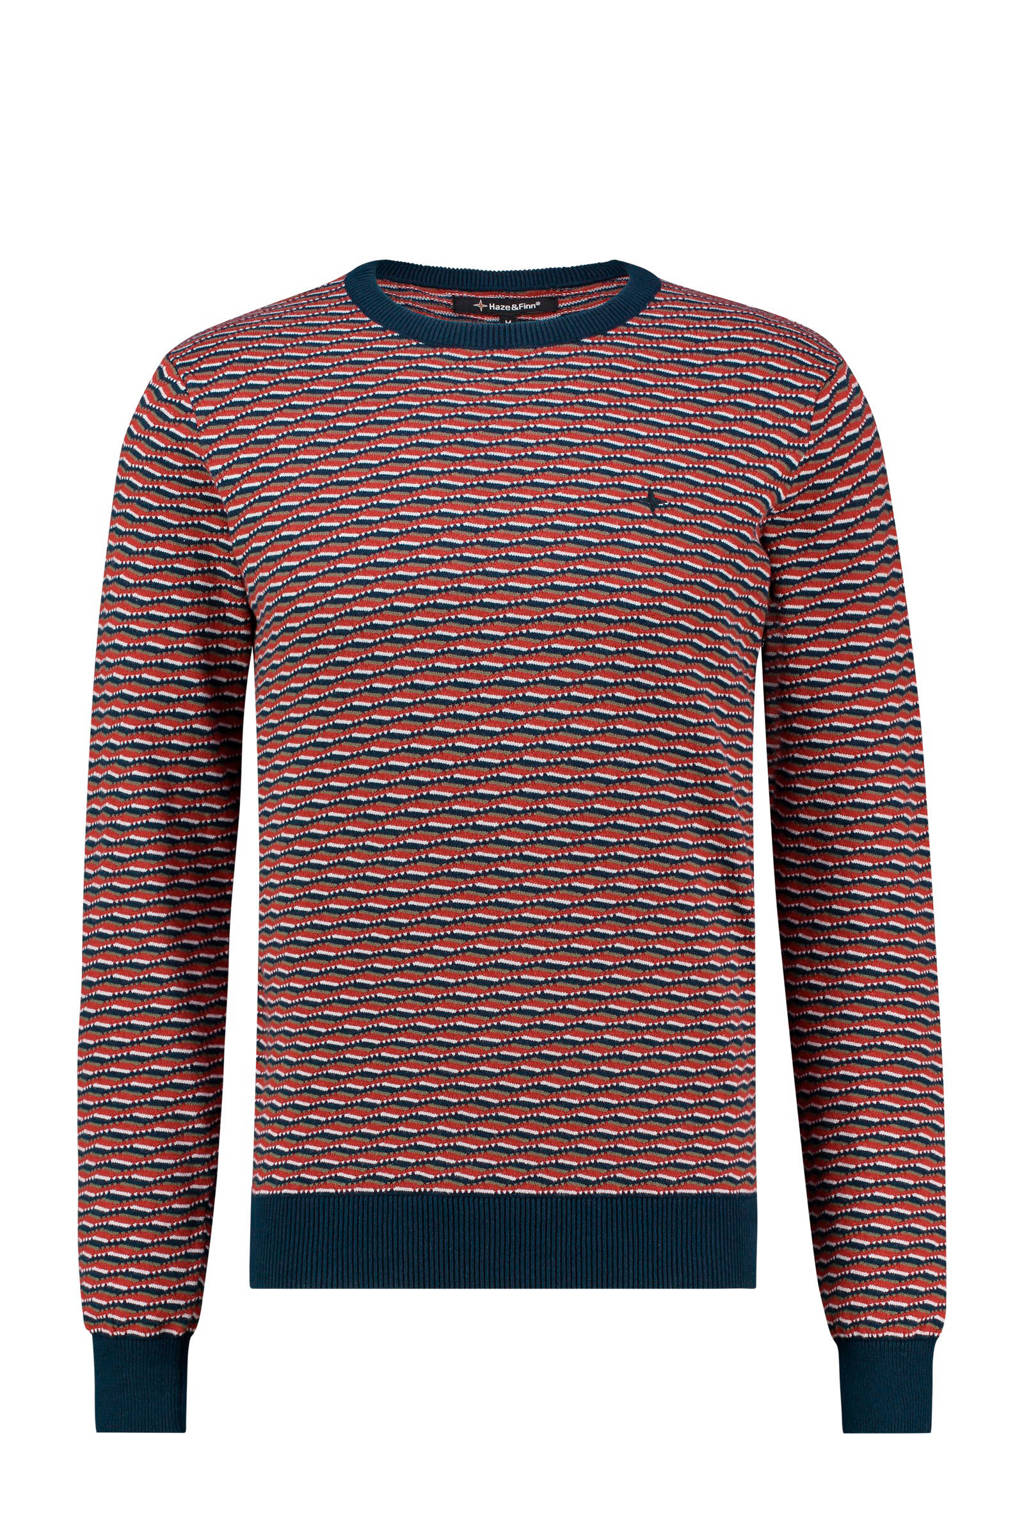 Haze & Finn trui met all over print rood, Rood/blauw/wit